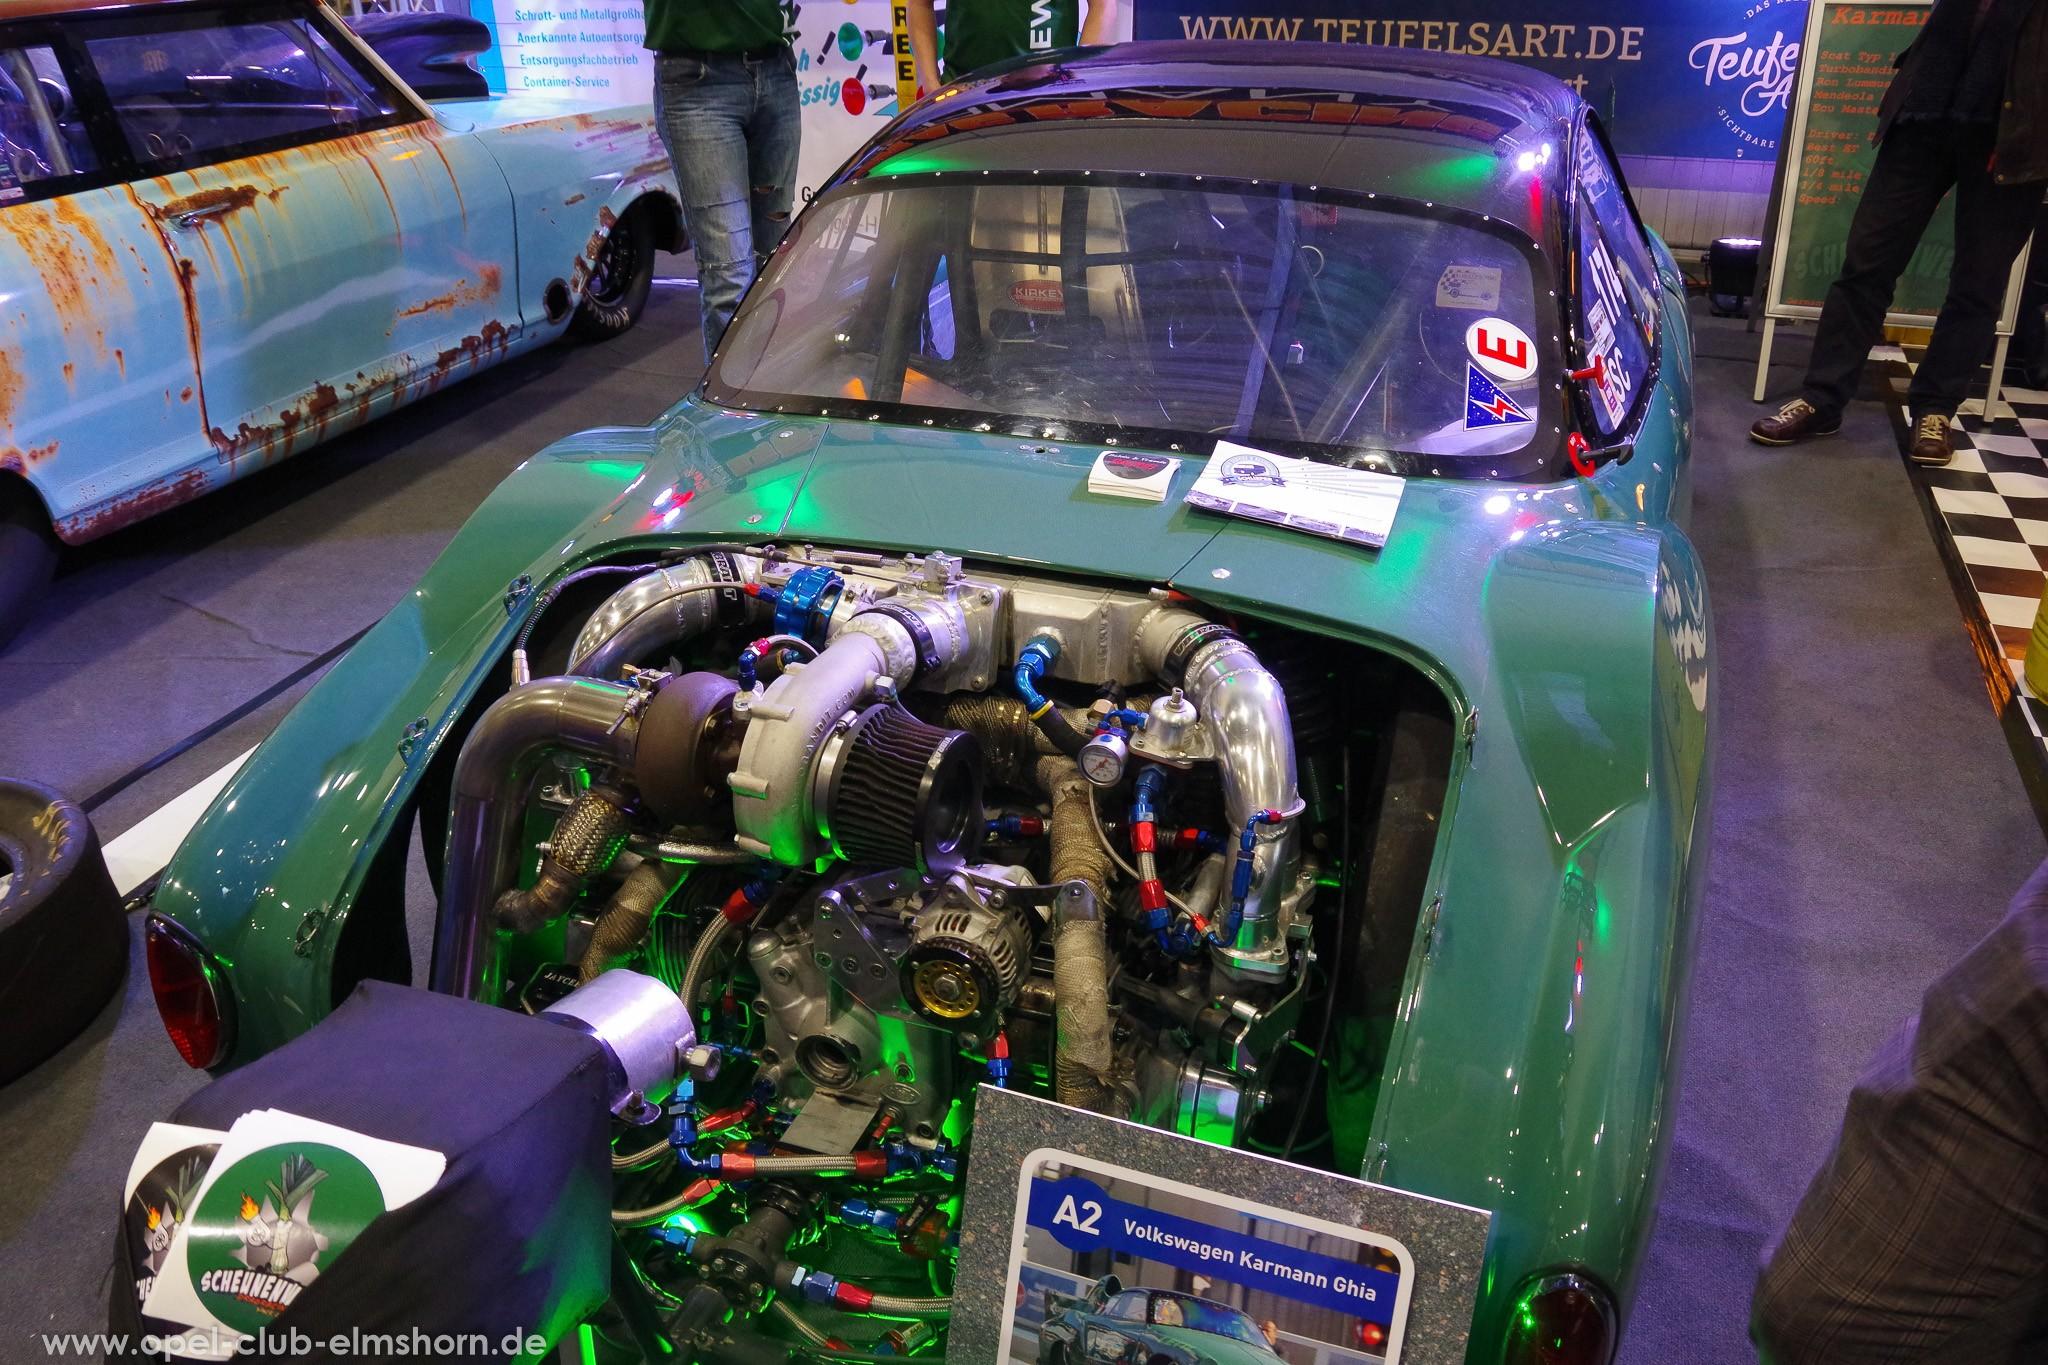 2020-02-02-Bremen-Classic-Motorshow-2020-20200201_131426-_